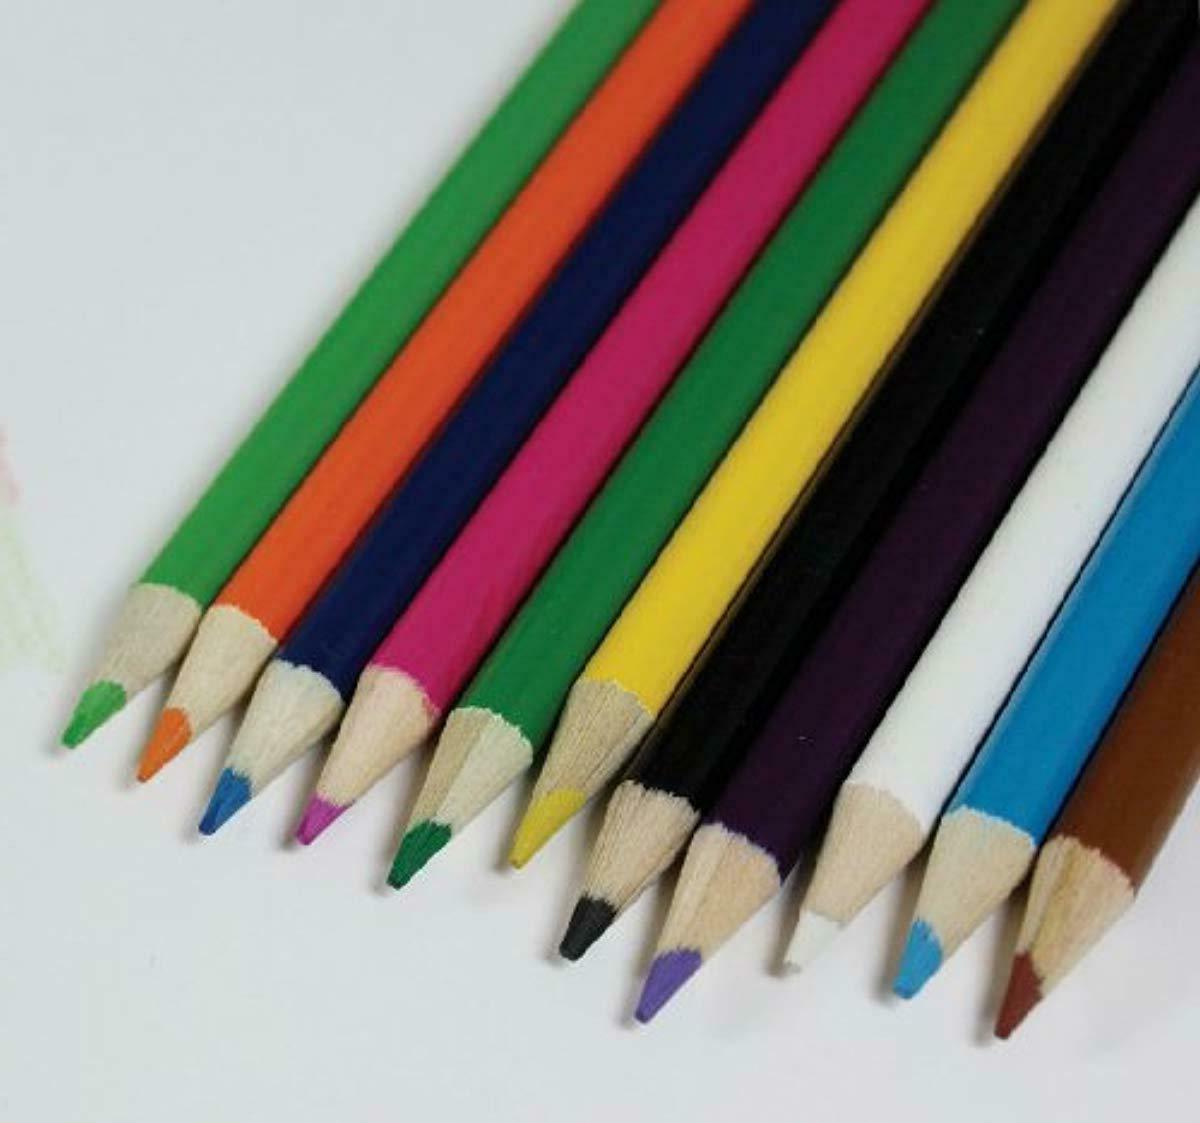 Sargent Art Premium Pencils, Pack Assorted Colors,